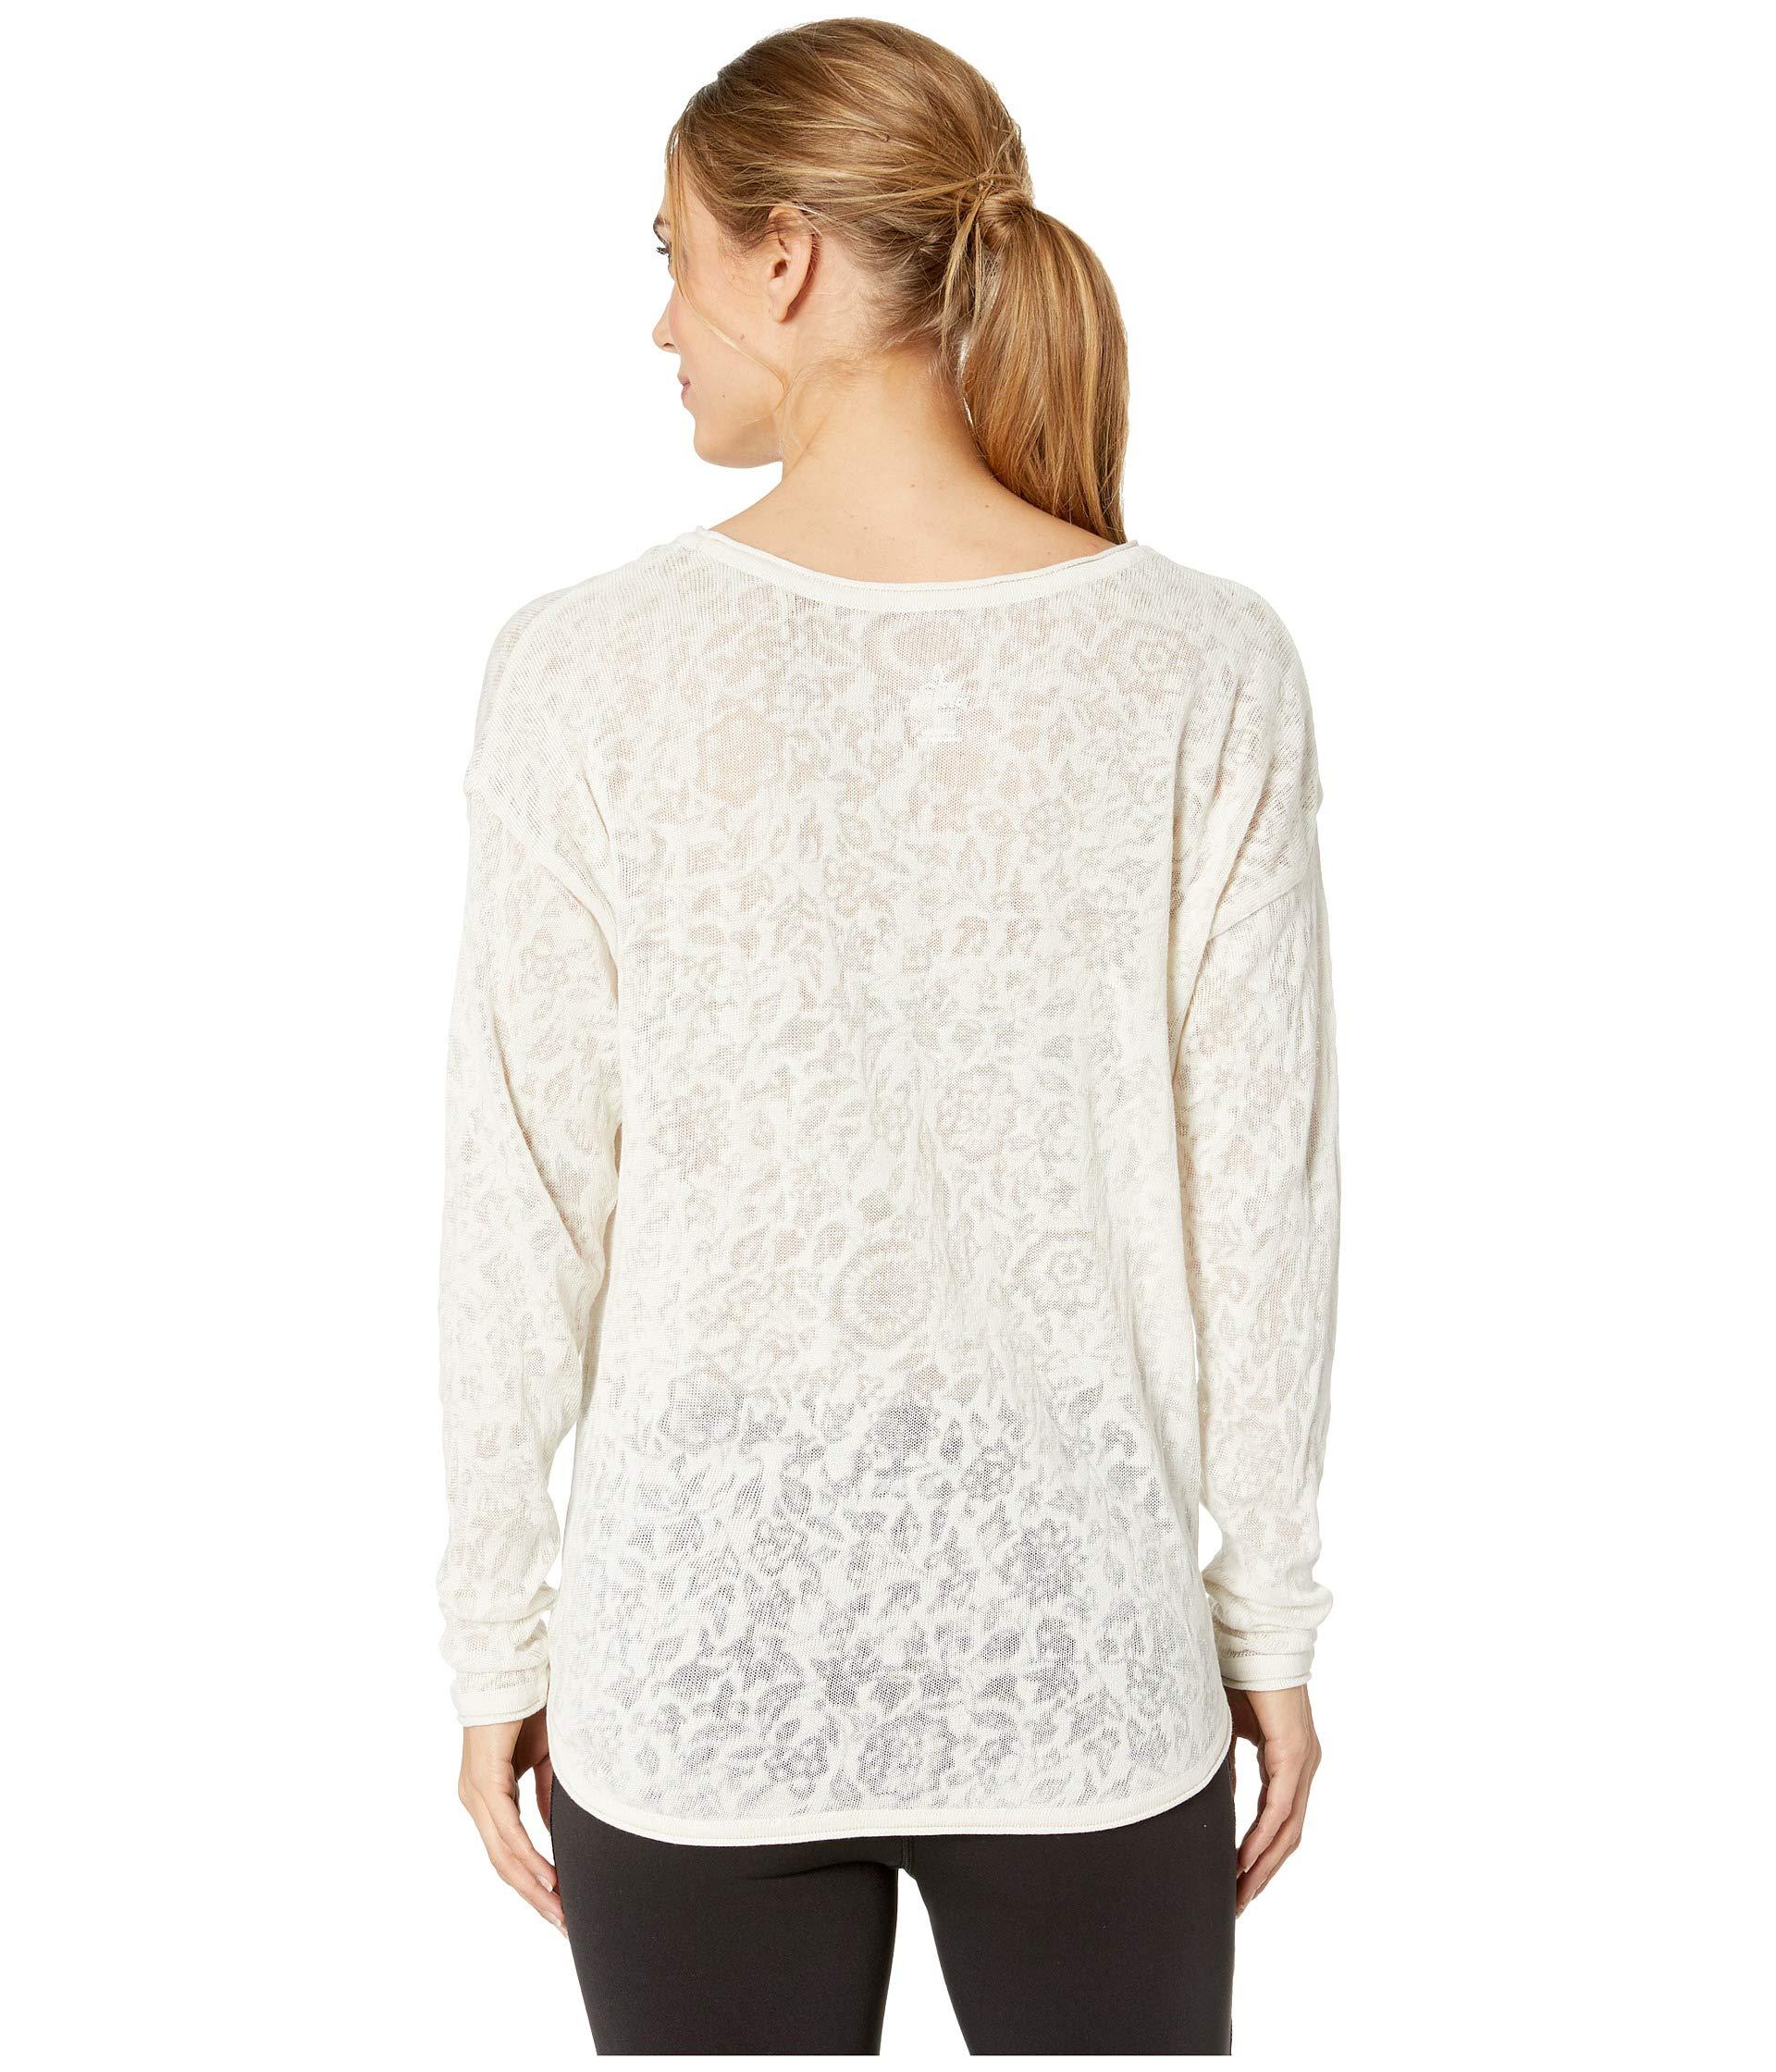 Grove Prana Prairie Prana Grove Bone Prairie Bone Grove Prana Sweater Sweater Prairie Sweater ZtOxvwx